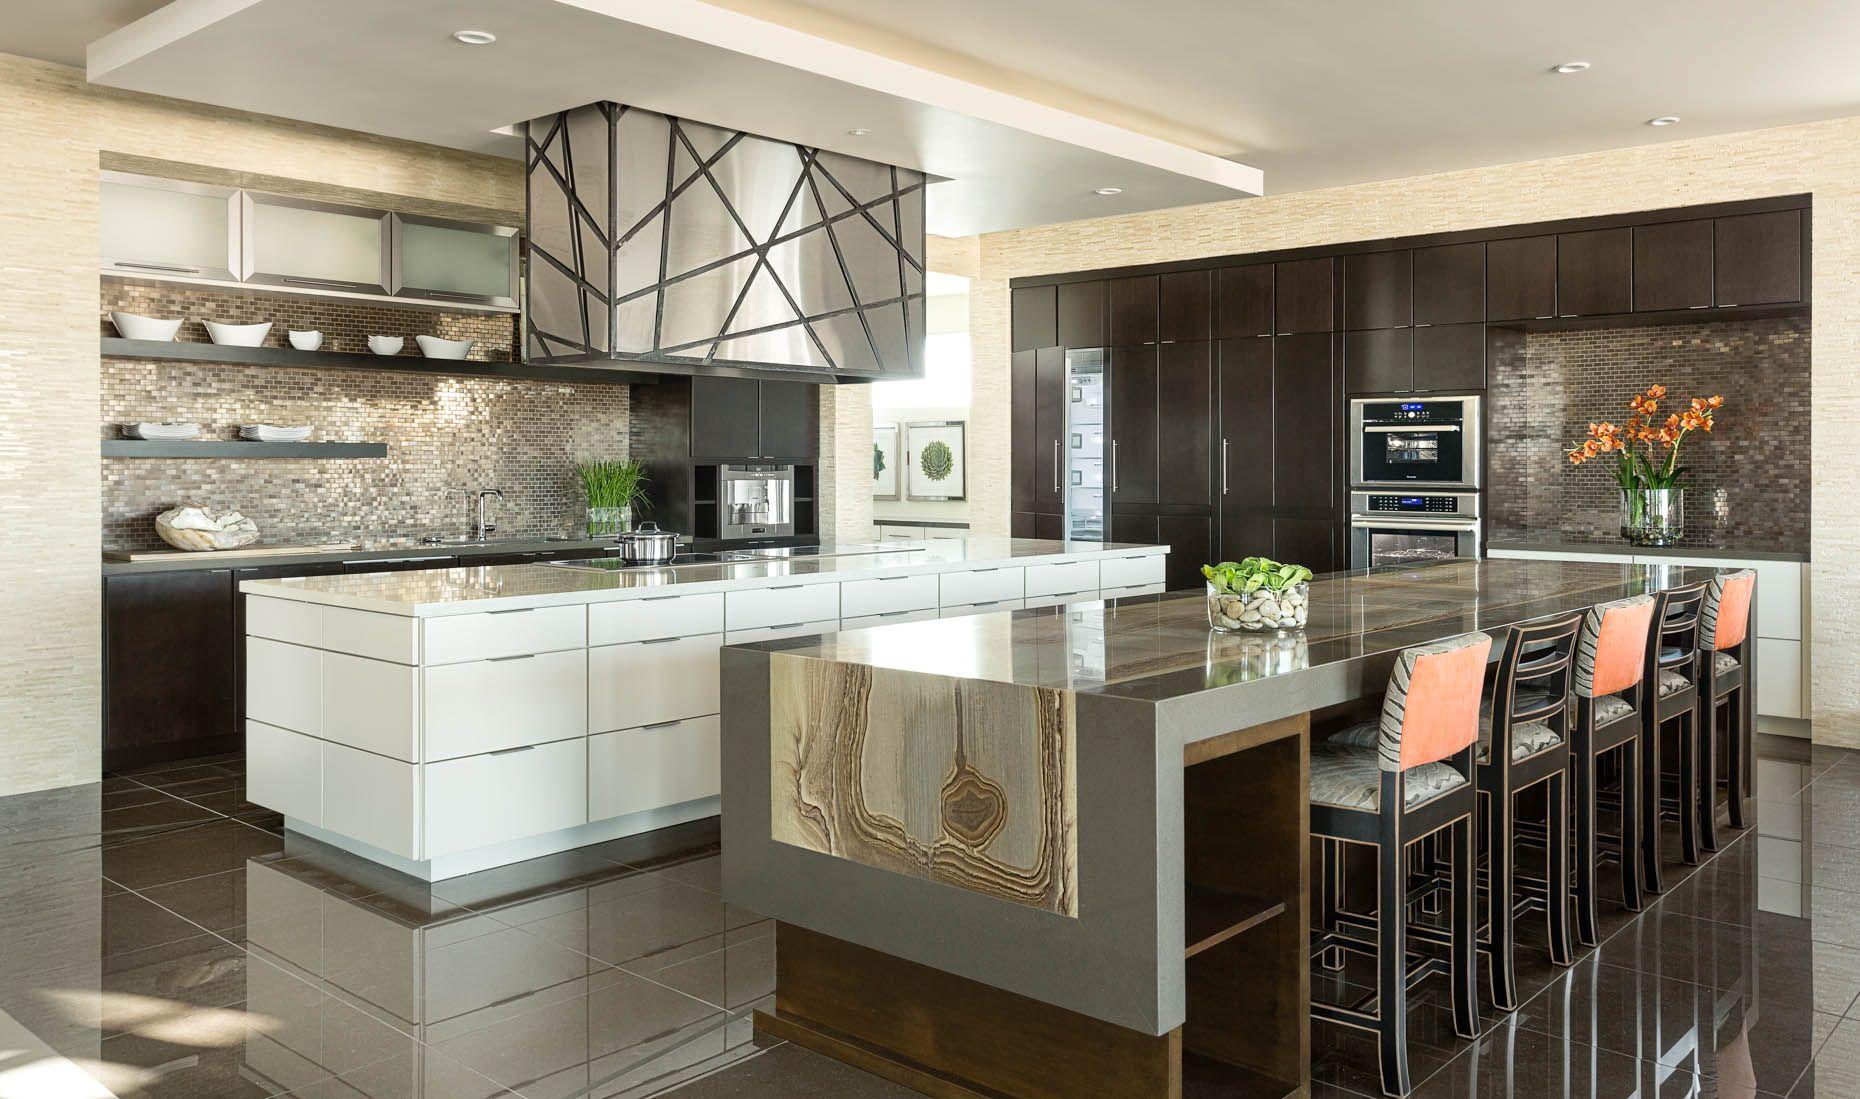 Award Winning Kitchen Designs Entrancing Award Winning Kitchens 2014  Google Search  Kitchen Designs Inspiration